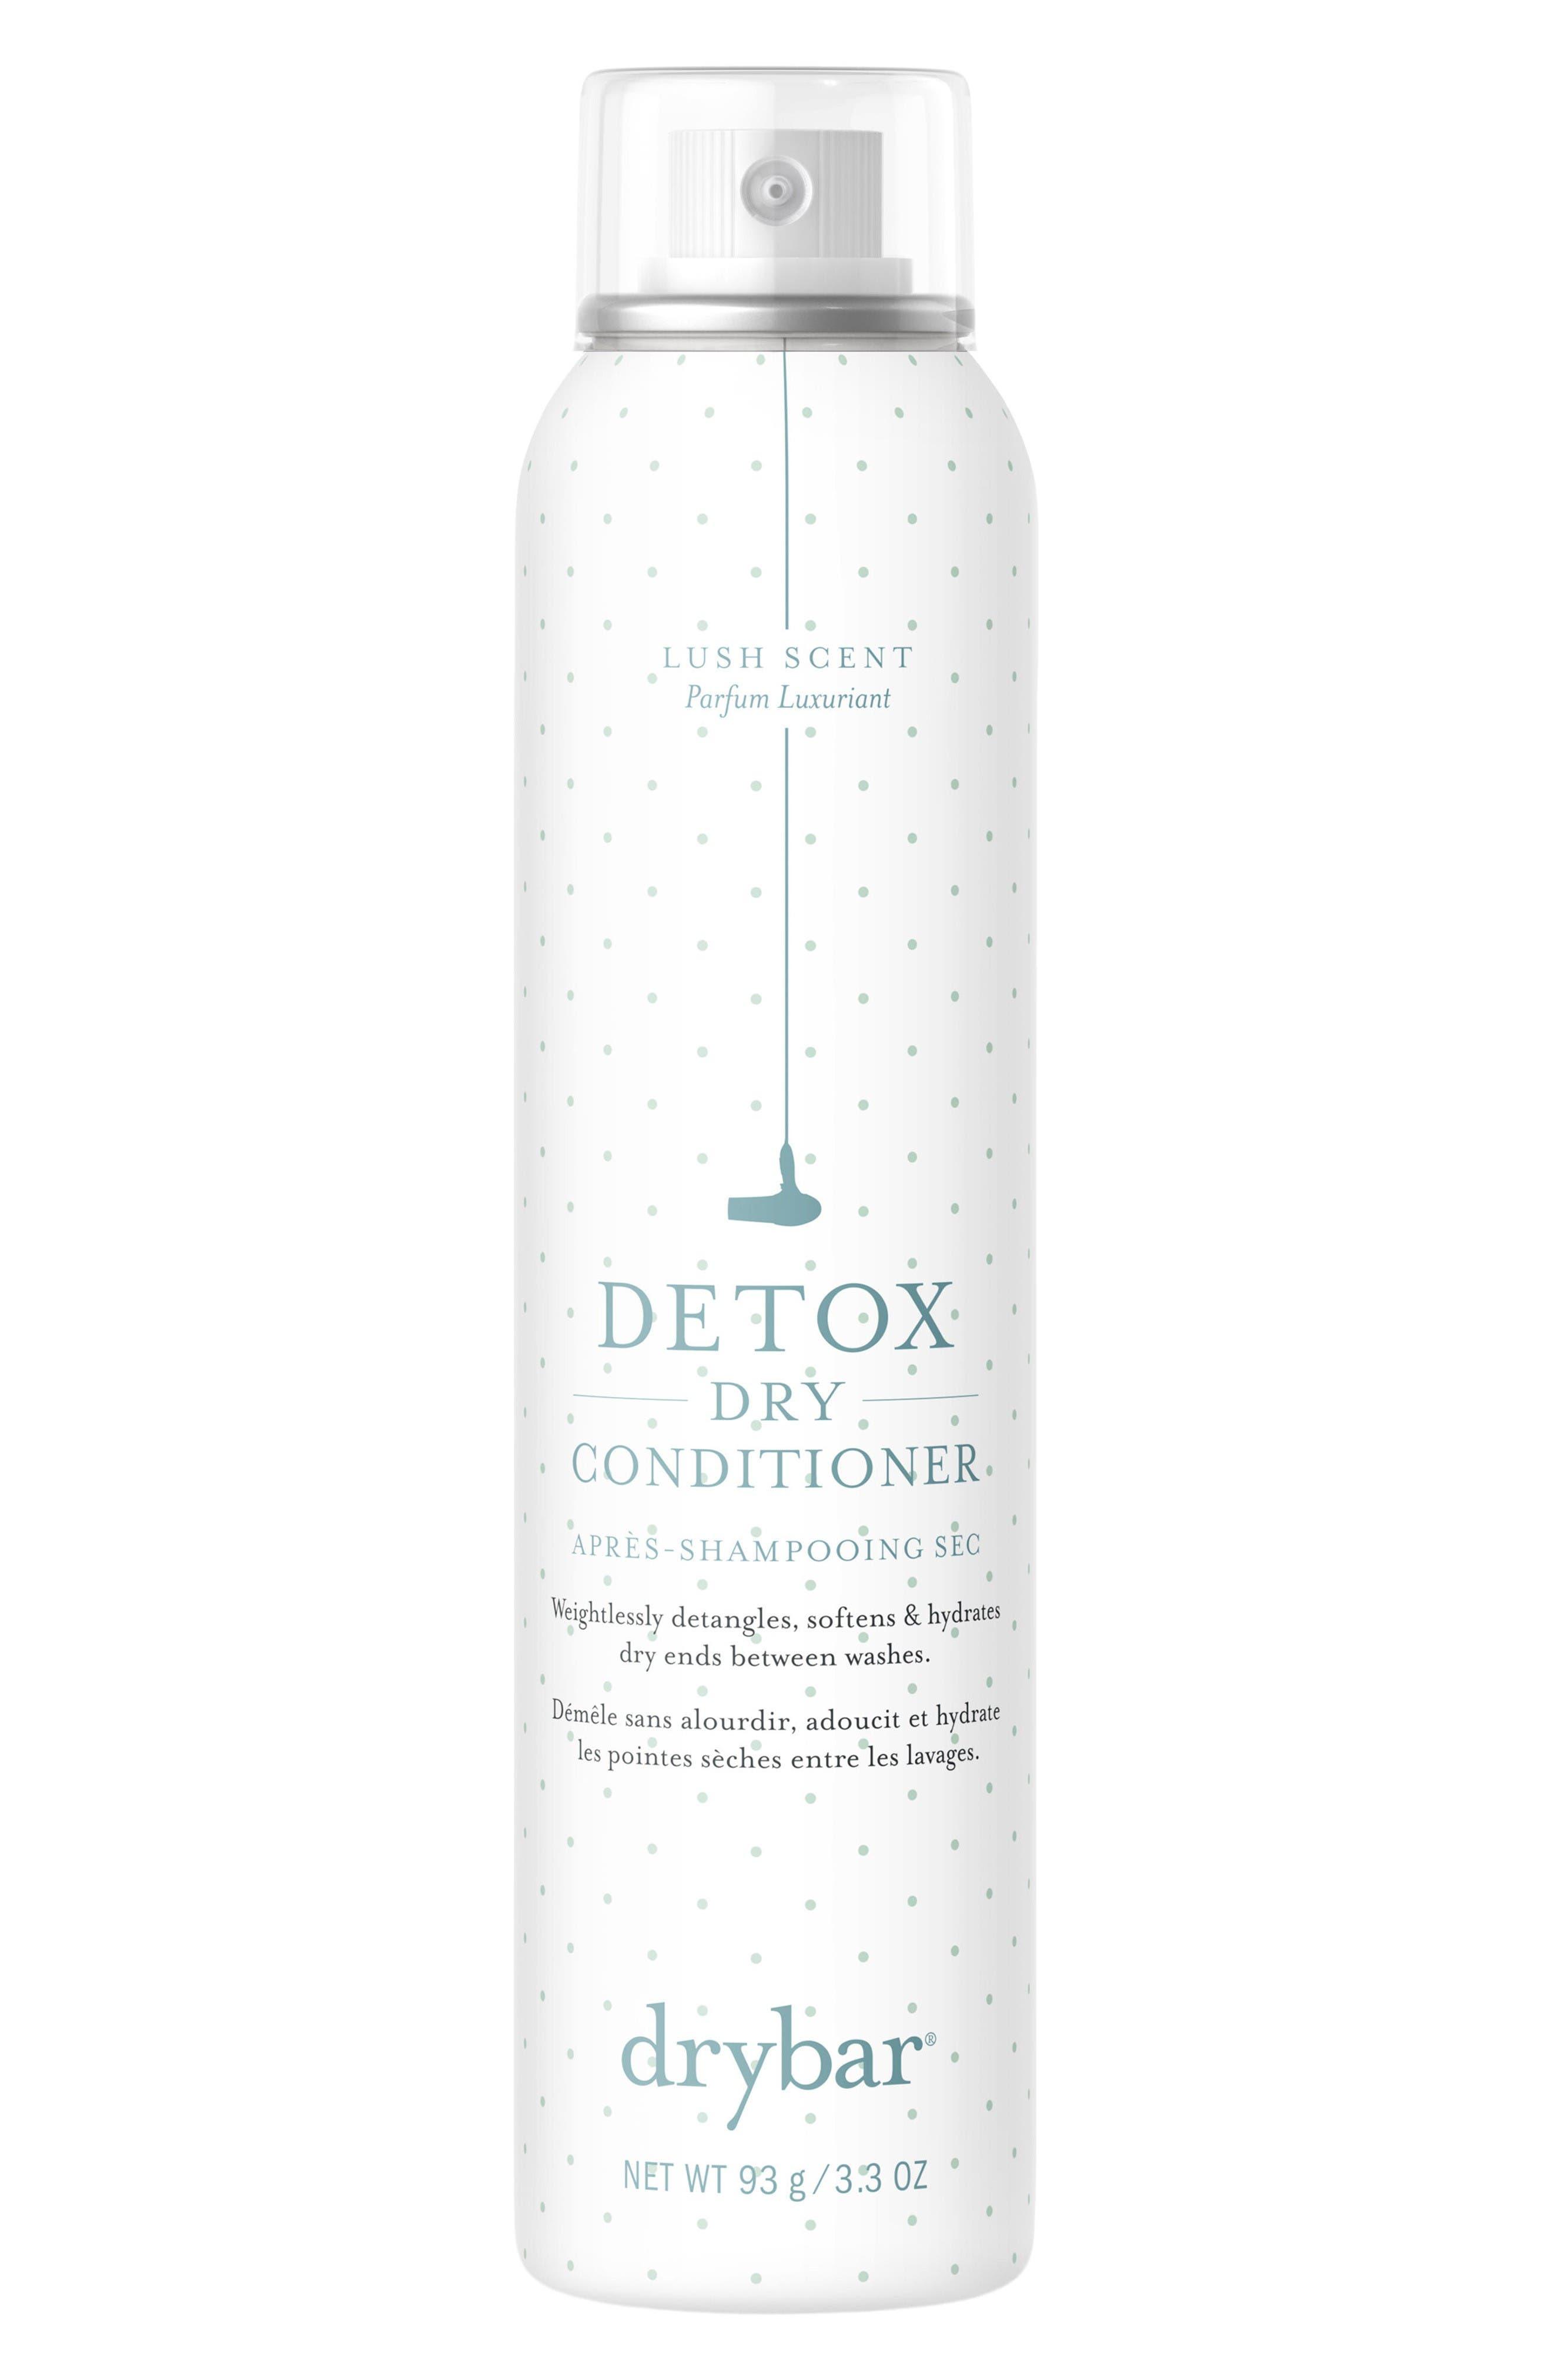 Main Image - Drybar Lush Scent Detox Dry Conditioner